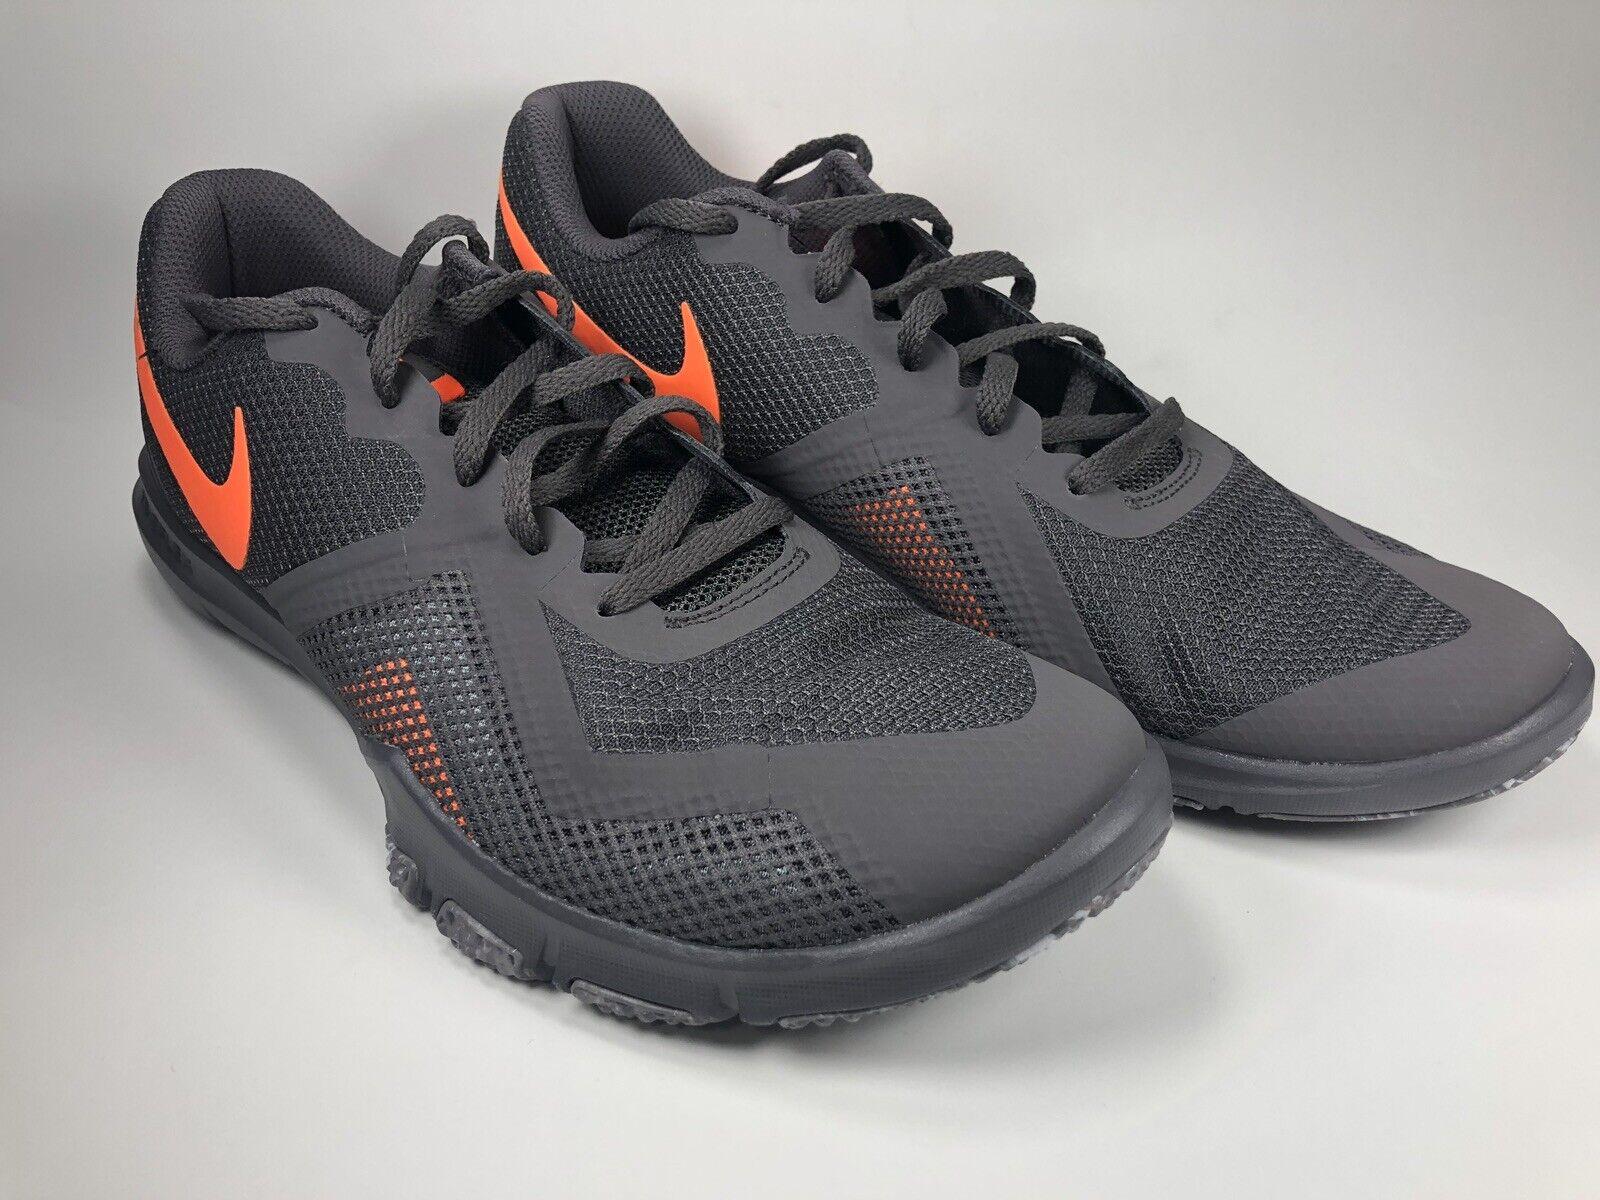 NIKE FLEX CONTROL II GREY  orange 924204 080 RUNNING SHOES Size 10